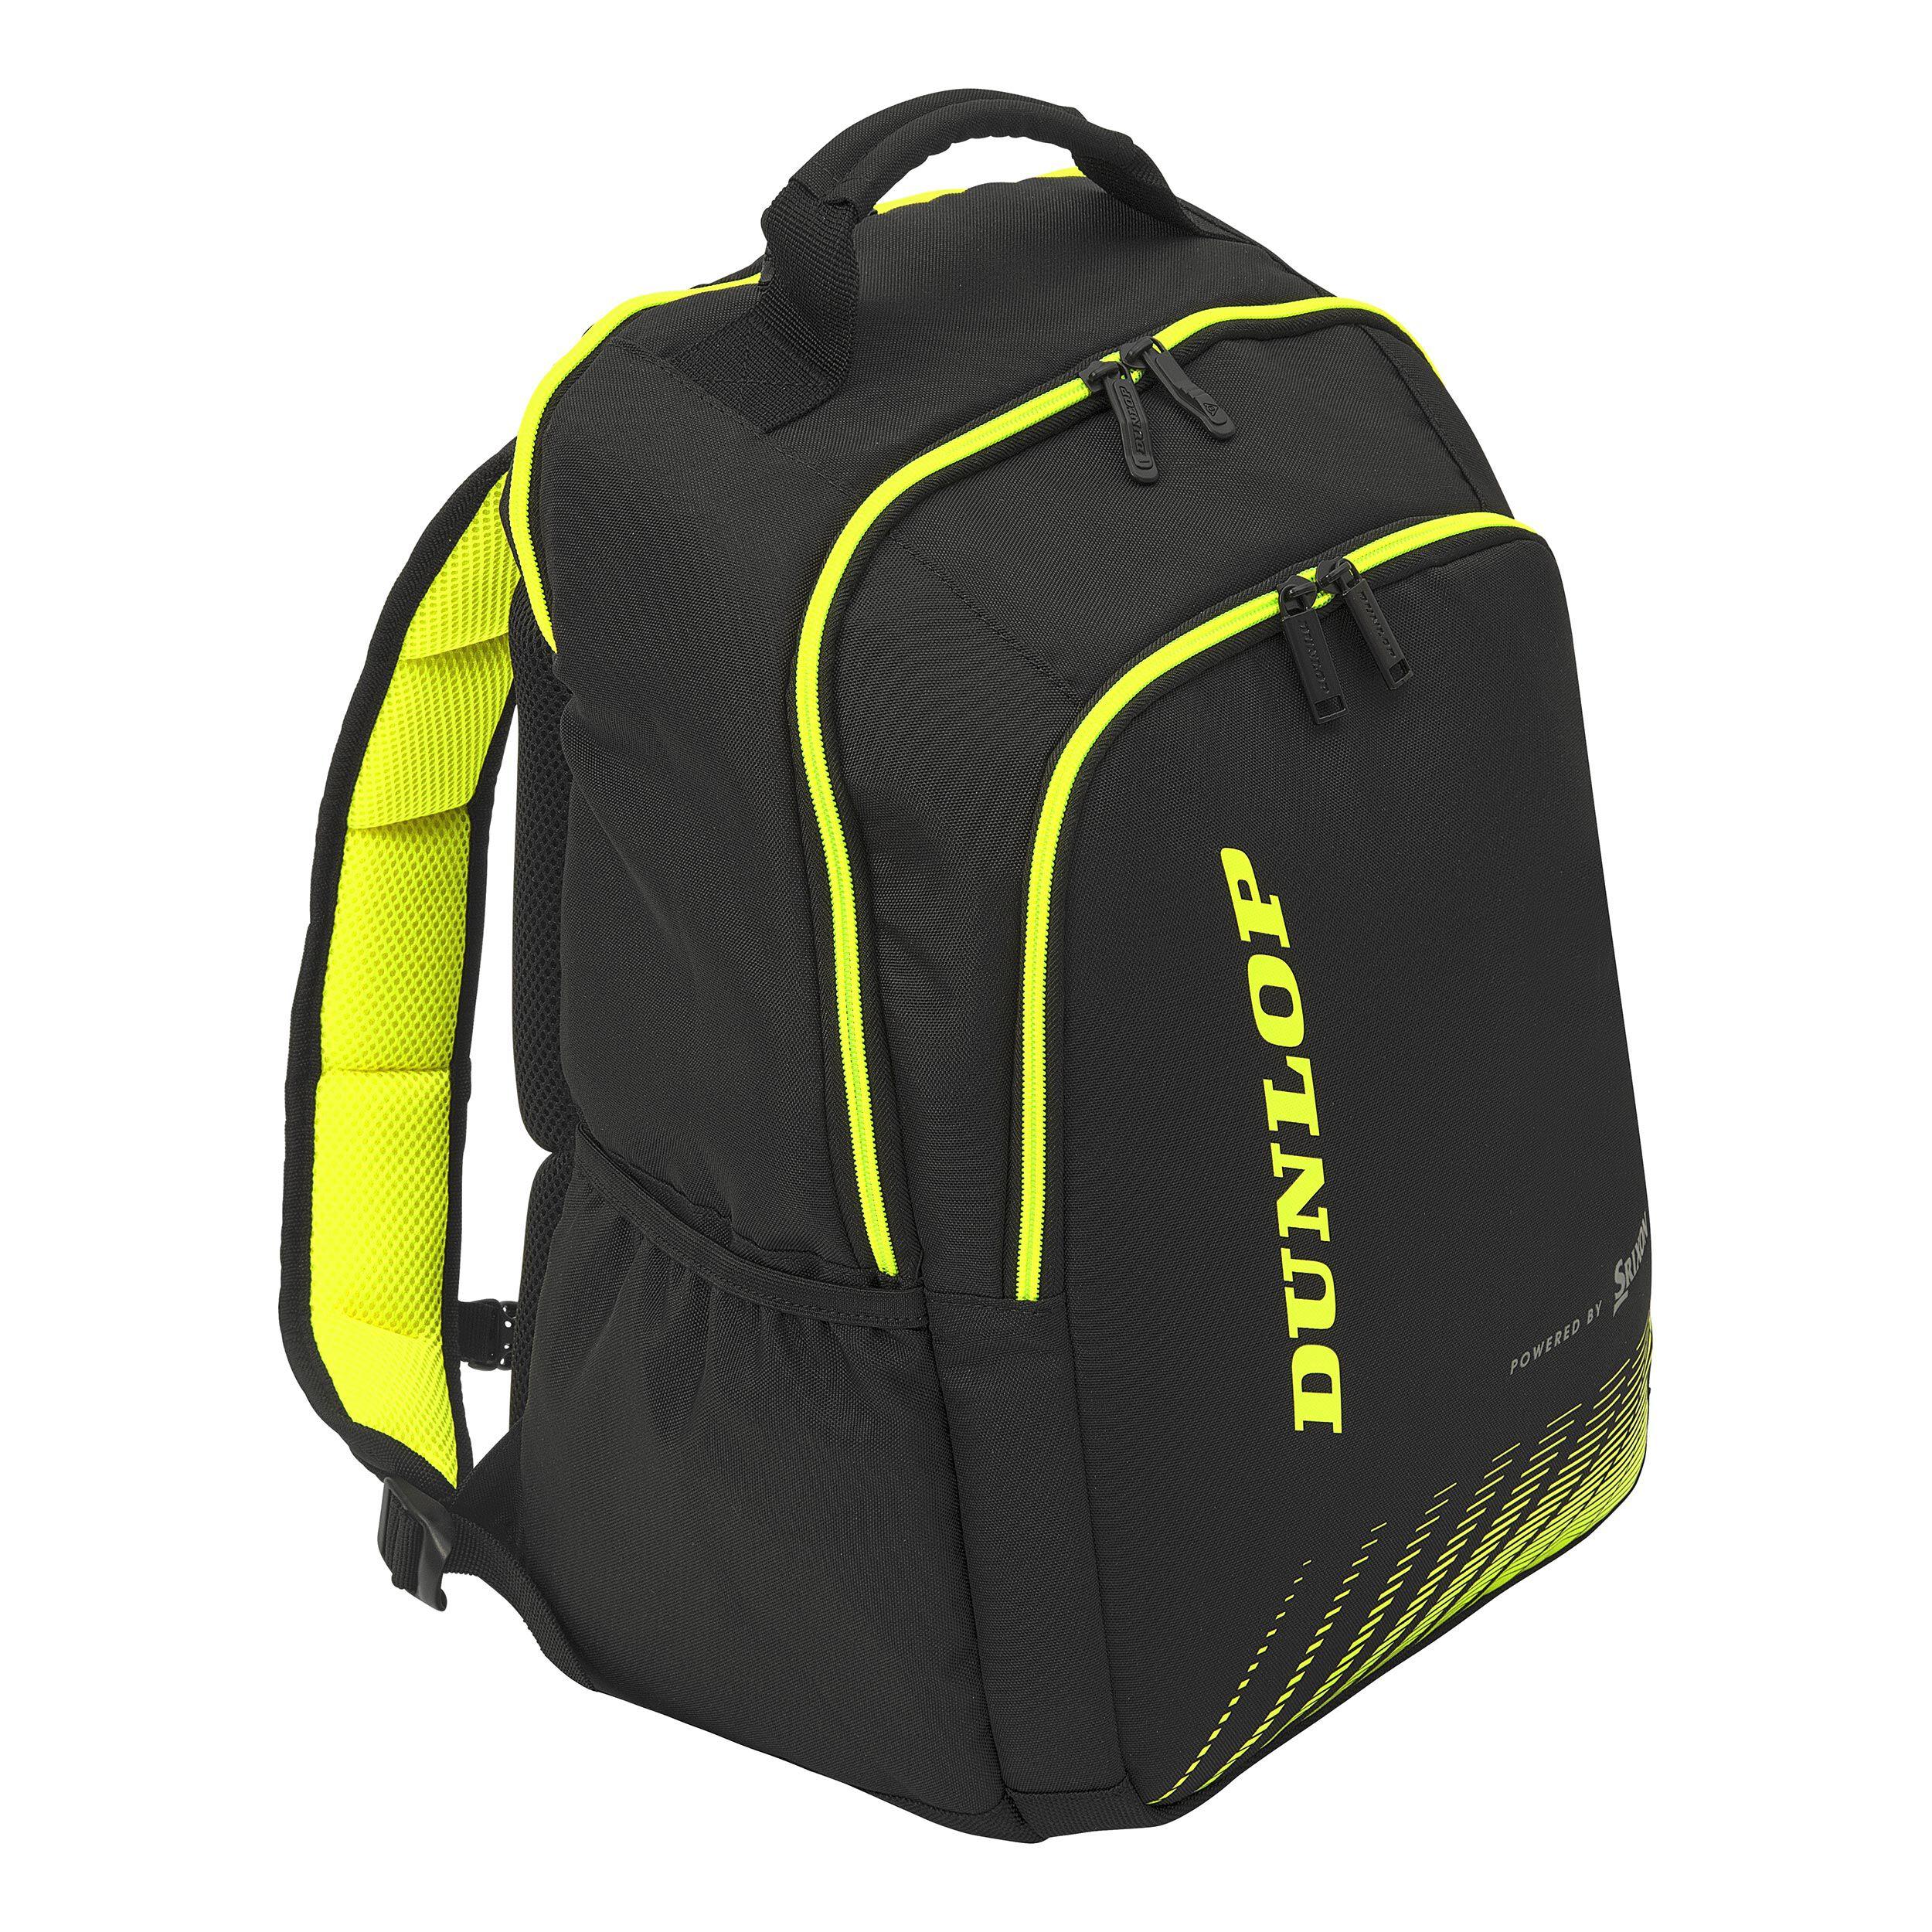 SX Performance Backpack Rugzak Zwart, Geel